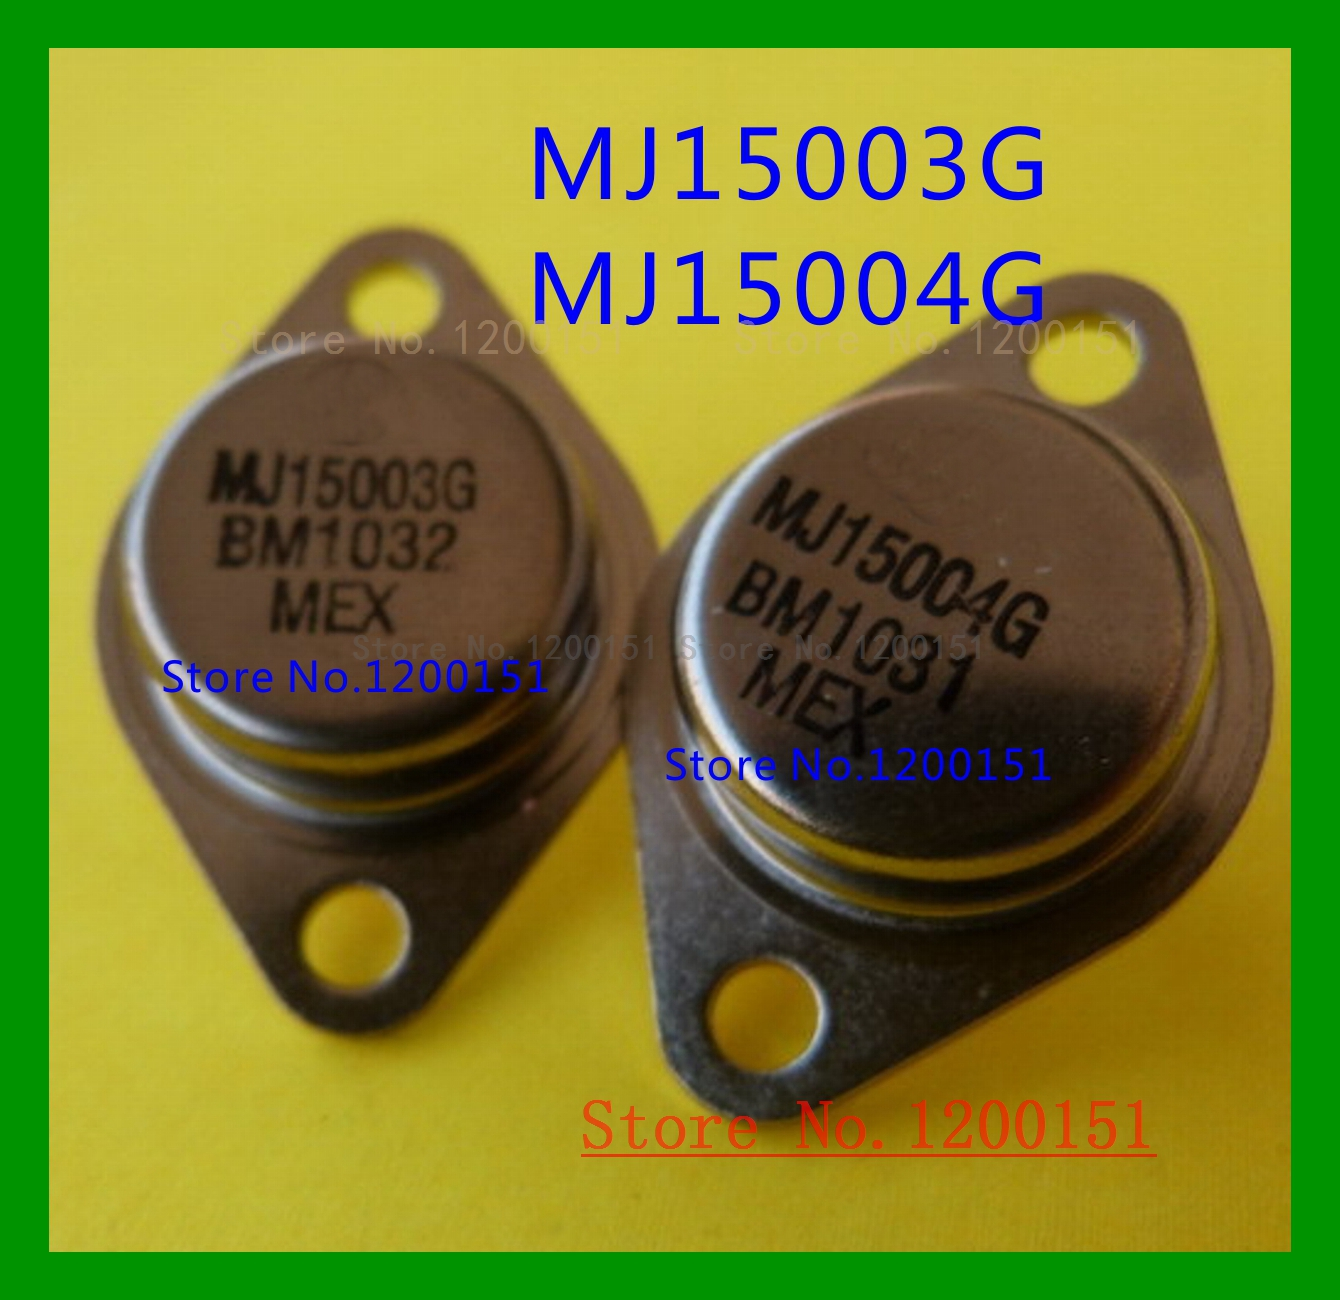 4pcs/lot=2PAIR MJ15003G MJ15004G MJ15003 MJ15004 TO-3 High Power Audio Power Amplifier Transistor